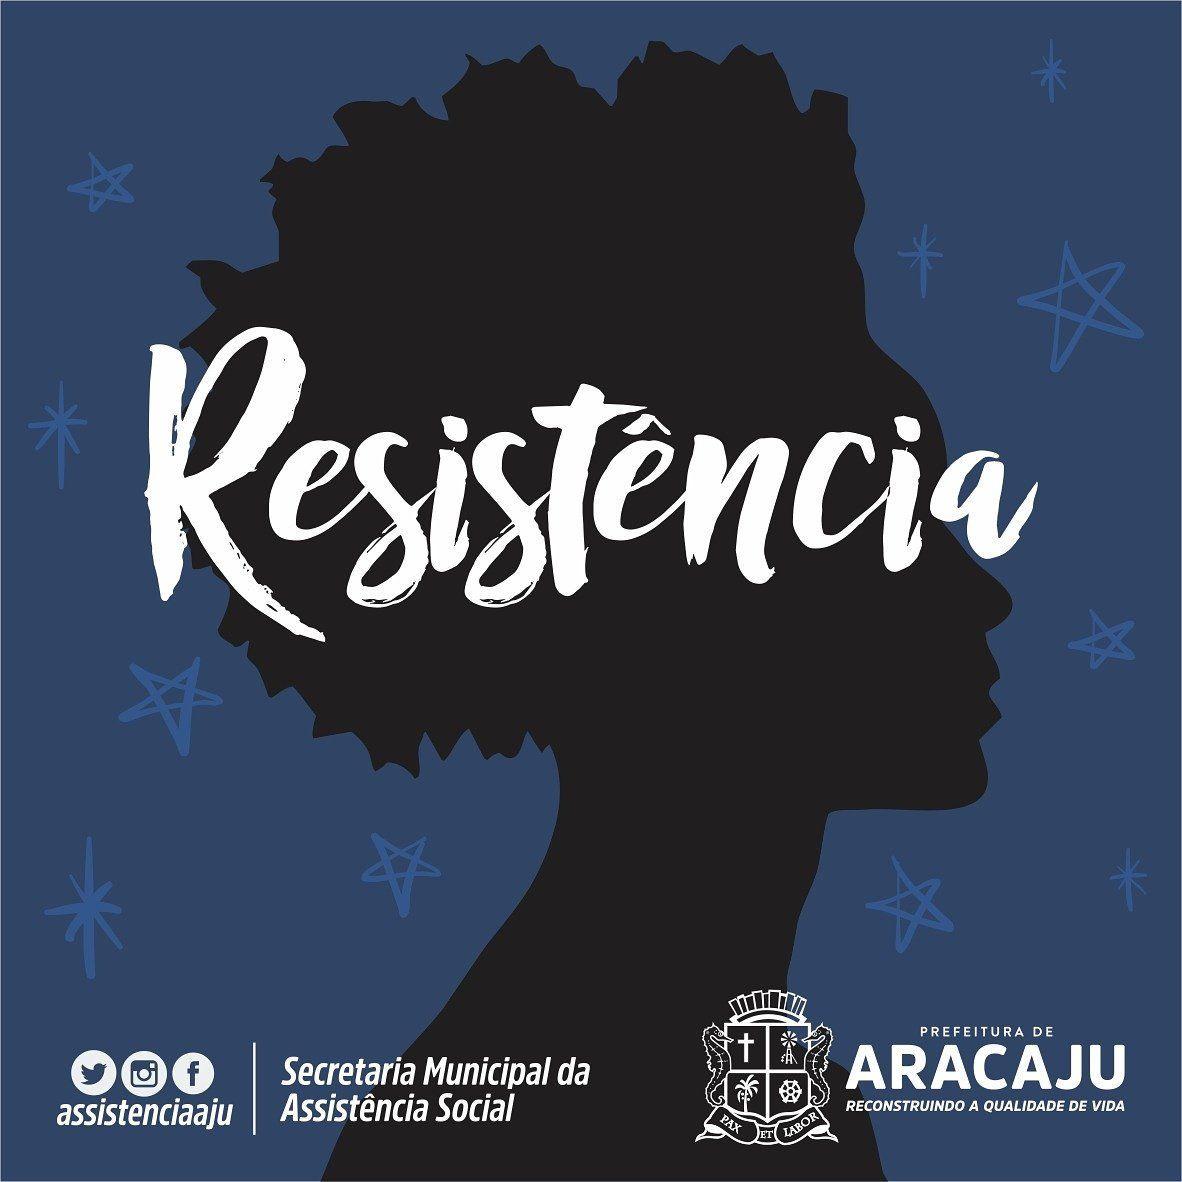 Tweets com conteúdo multimídia por Assistência Aracaju (@assistenciaaju) | Twitter